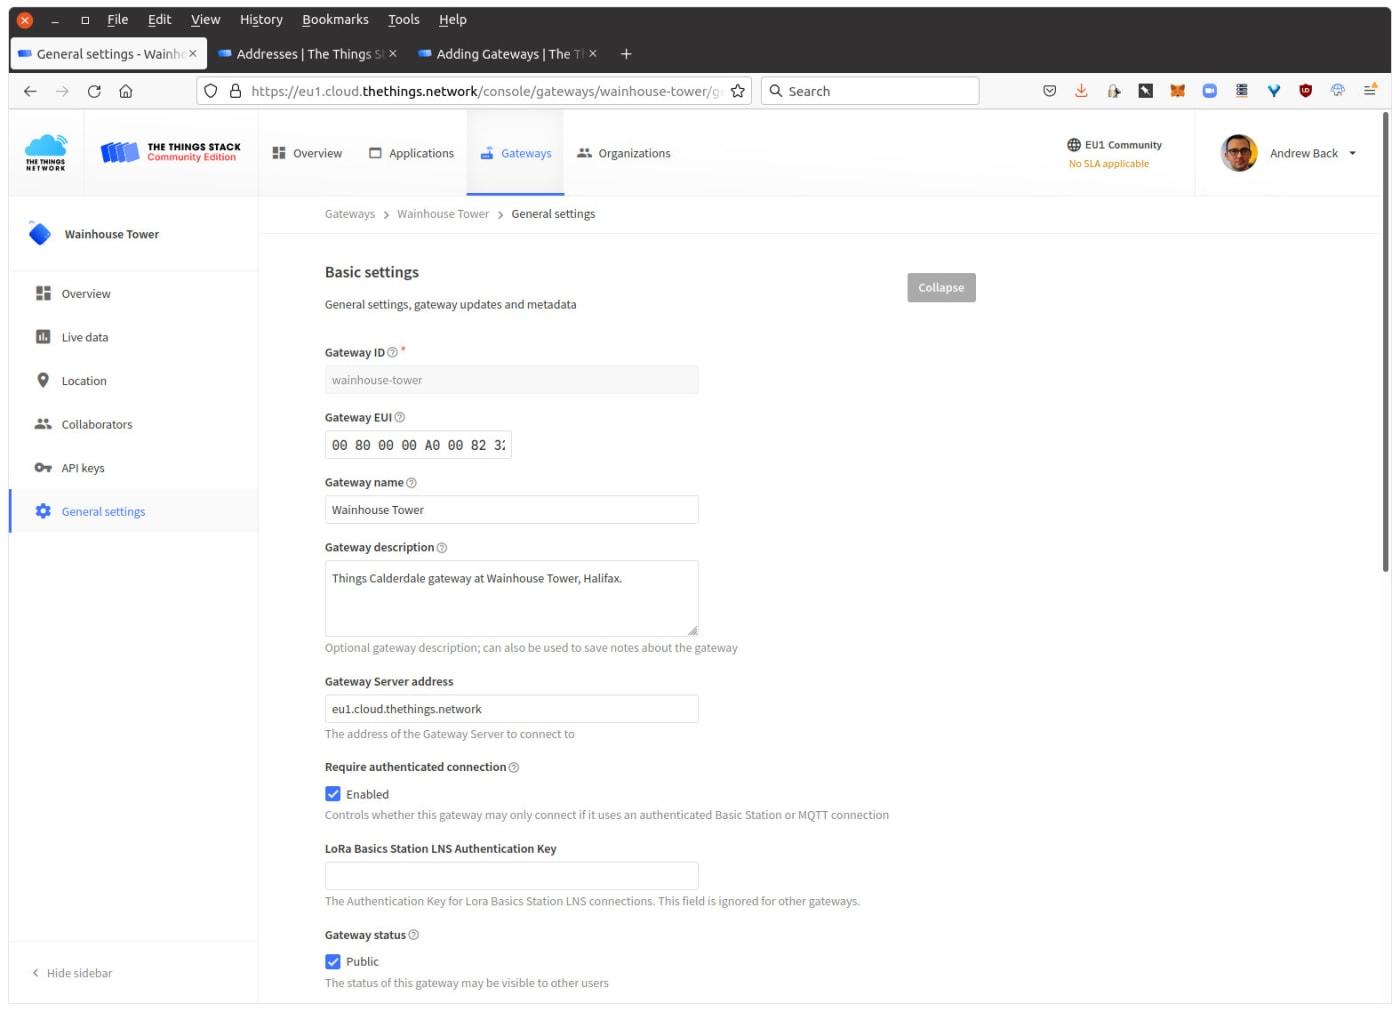 Enter key in basic settings screen